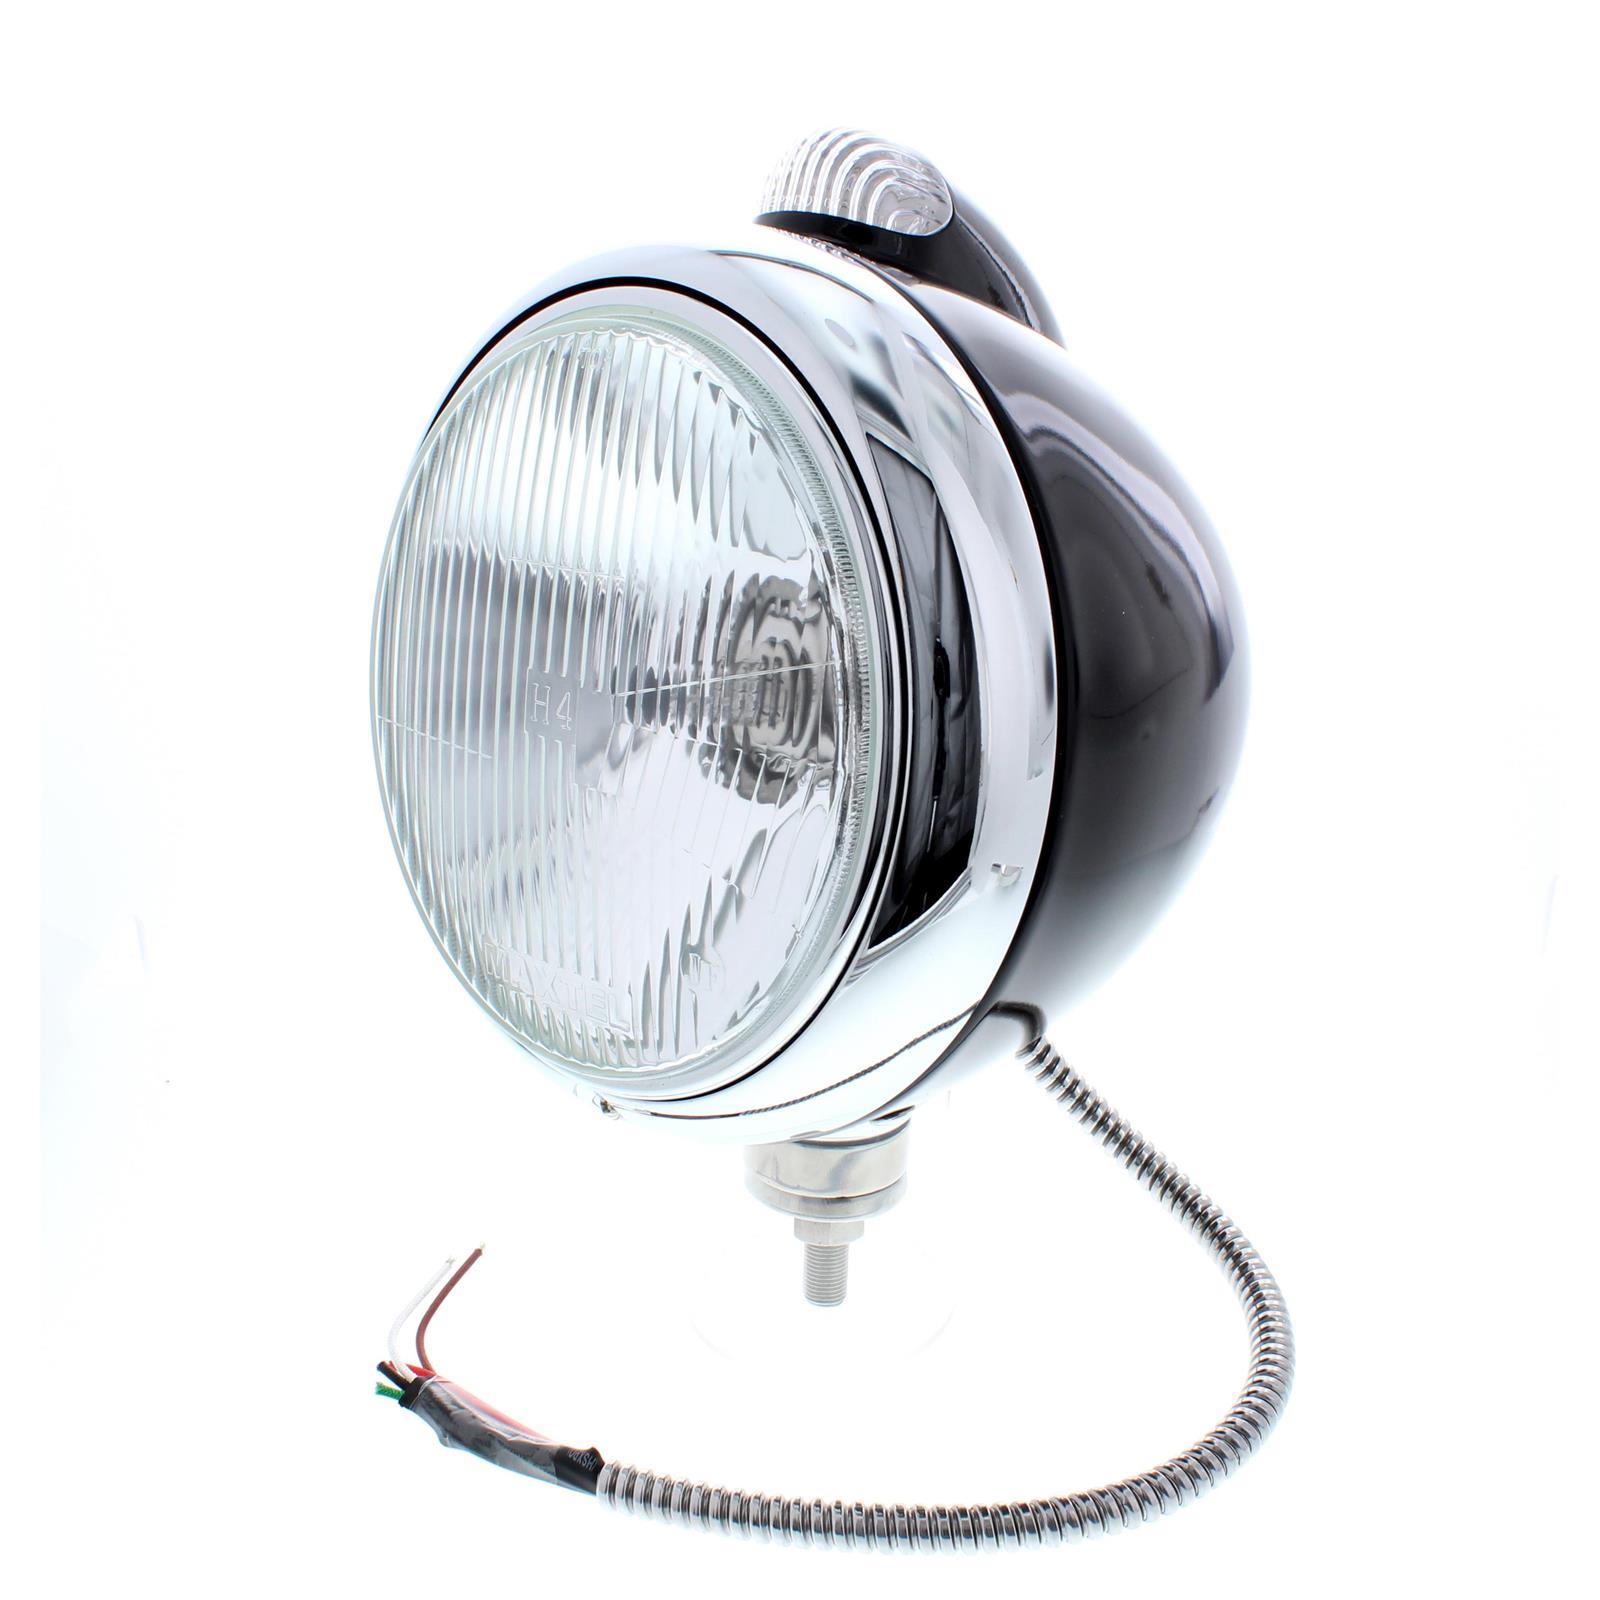 Speedway Guide 682 C Style 12 Volt Headlight Black Halogen Lamp Soft Starter Circuit